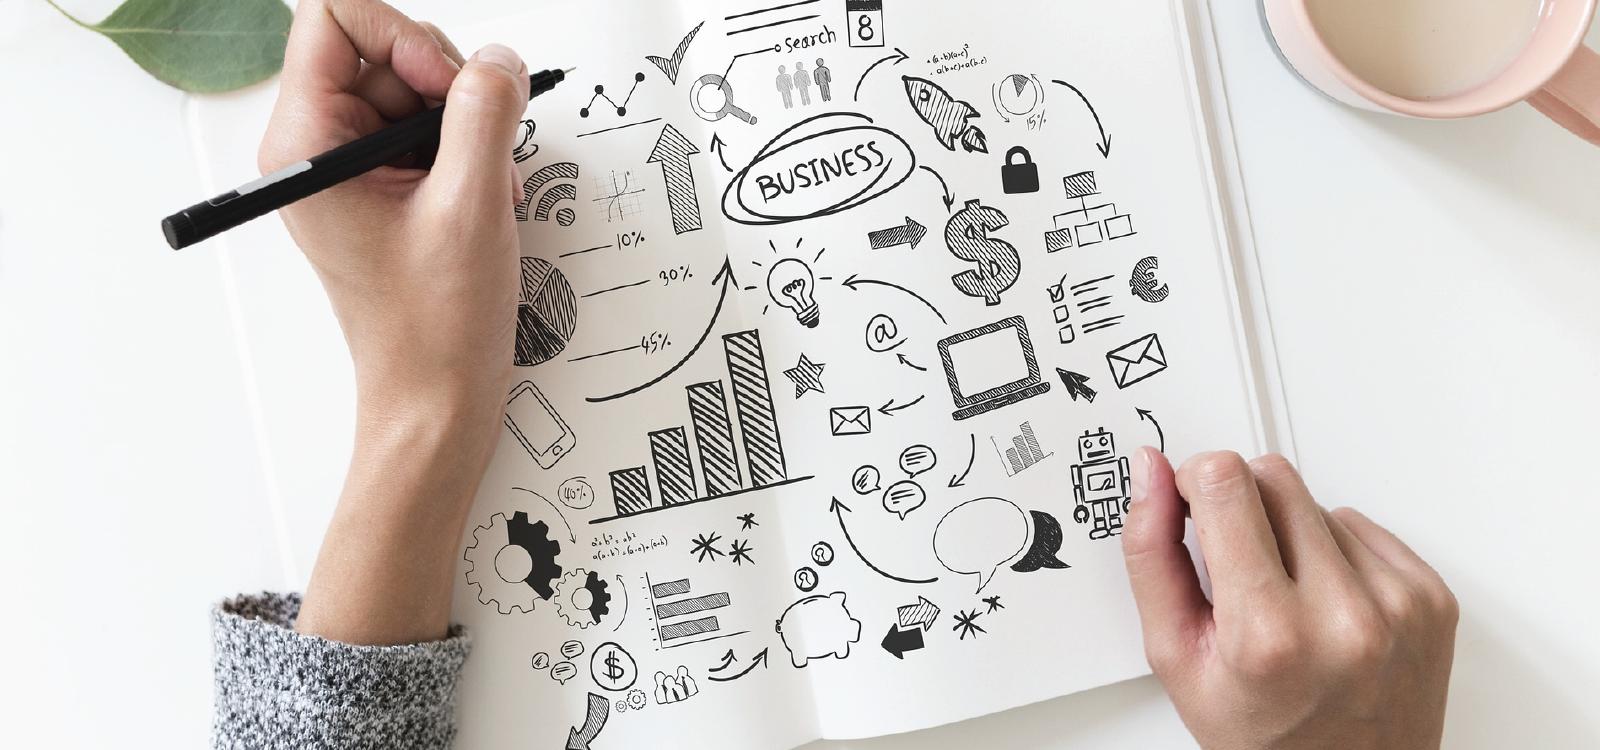 Warren Averett Business Strategy Image